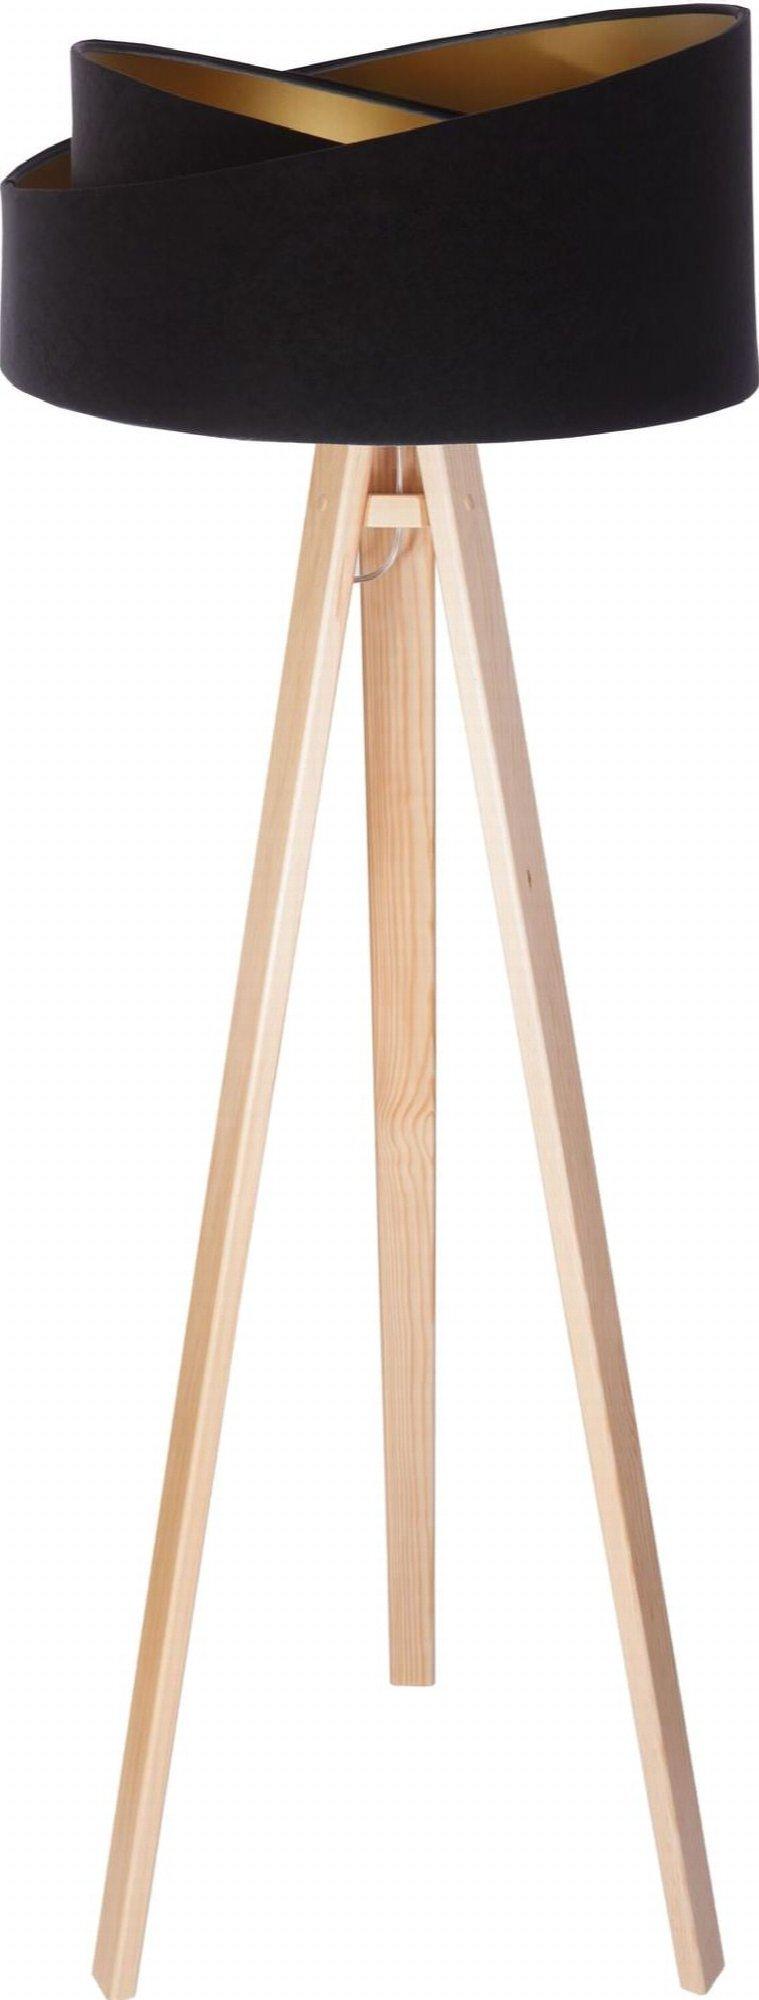 Lampadaire bois clair h145